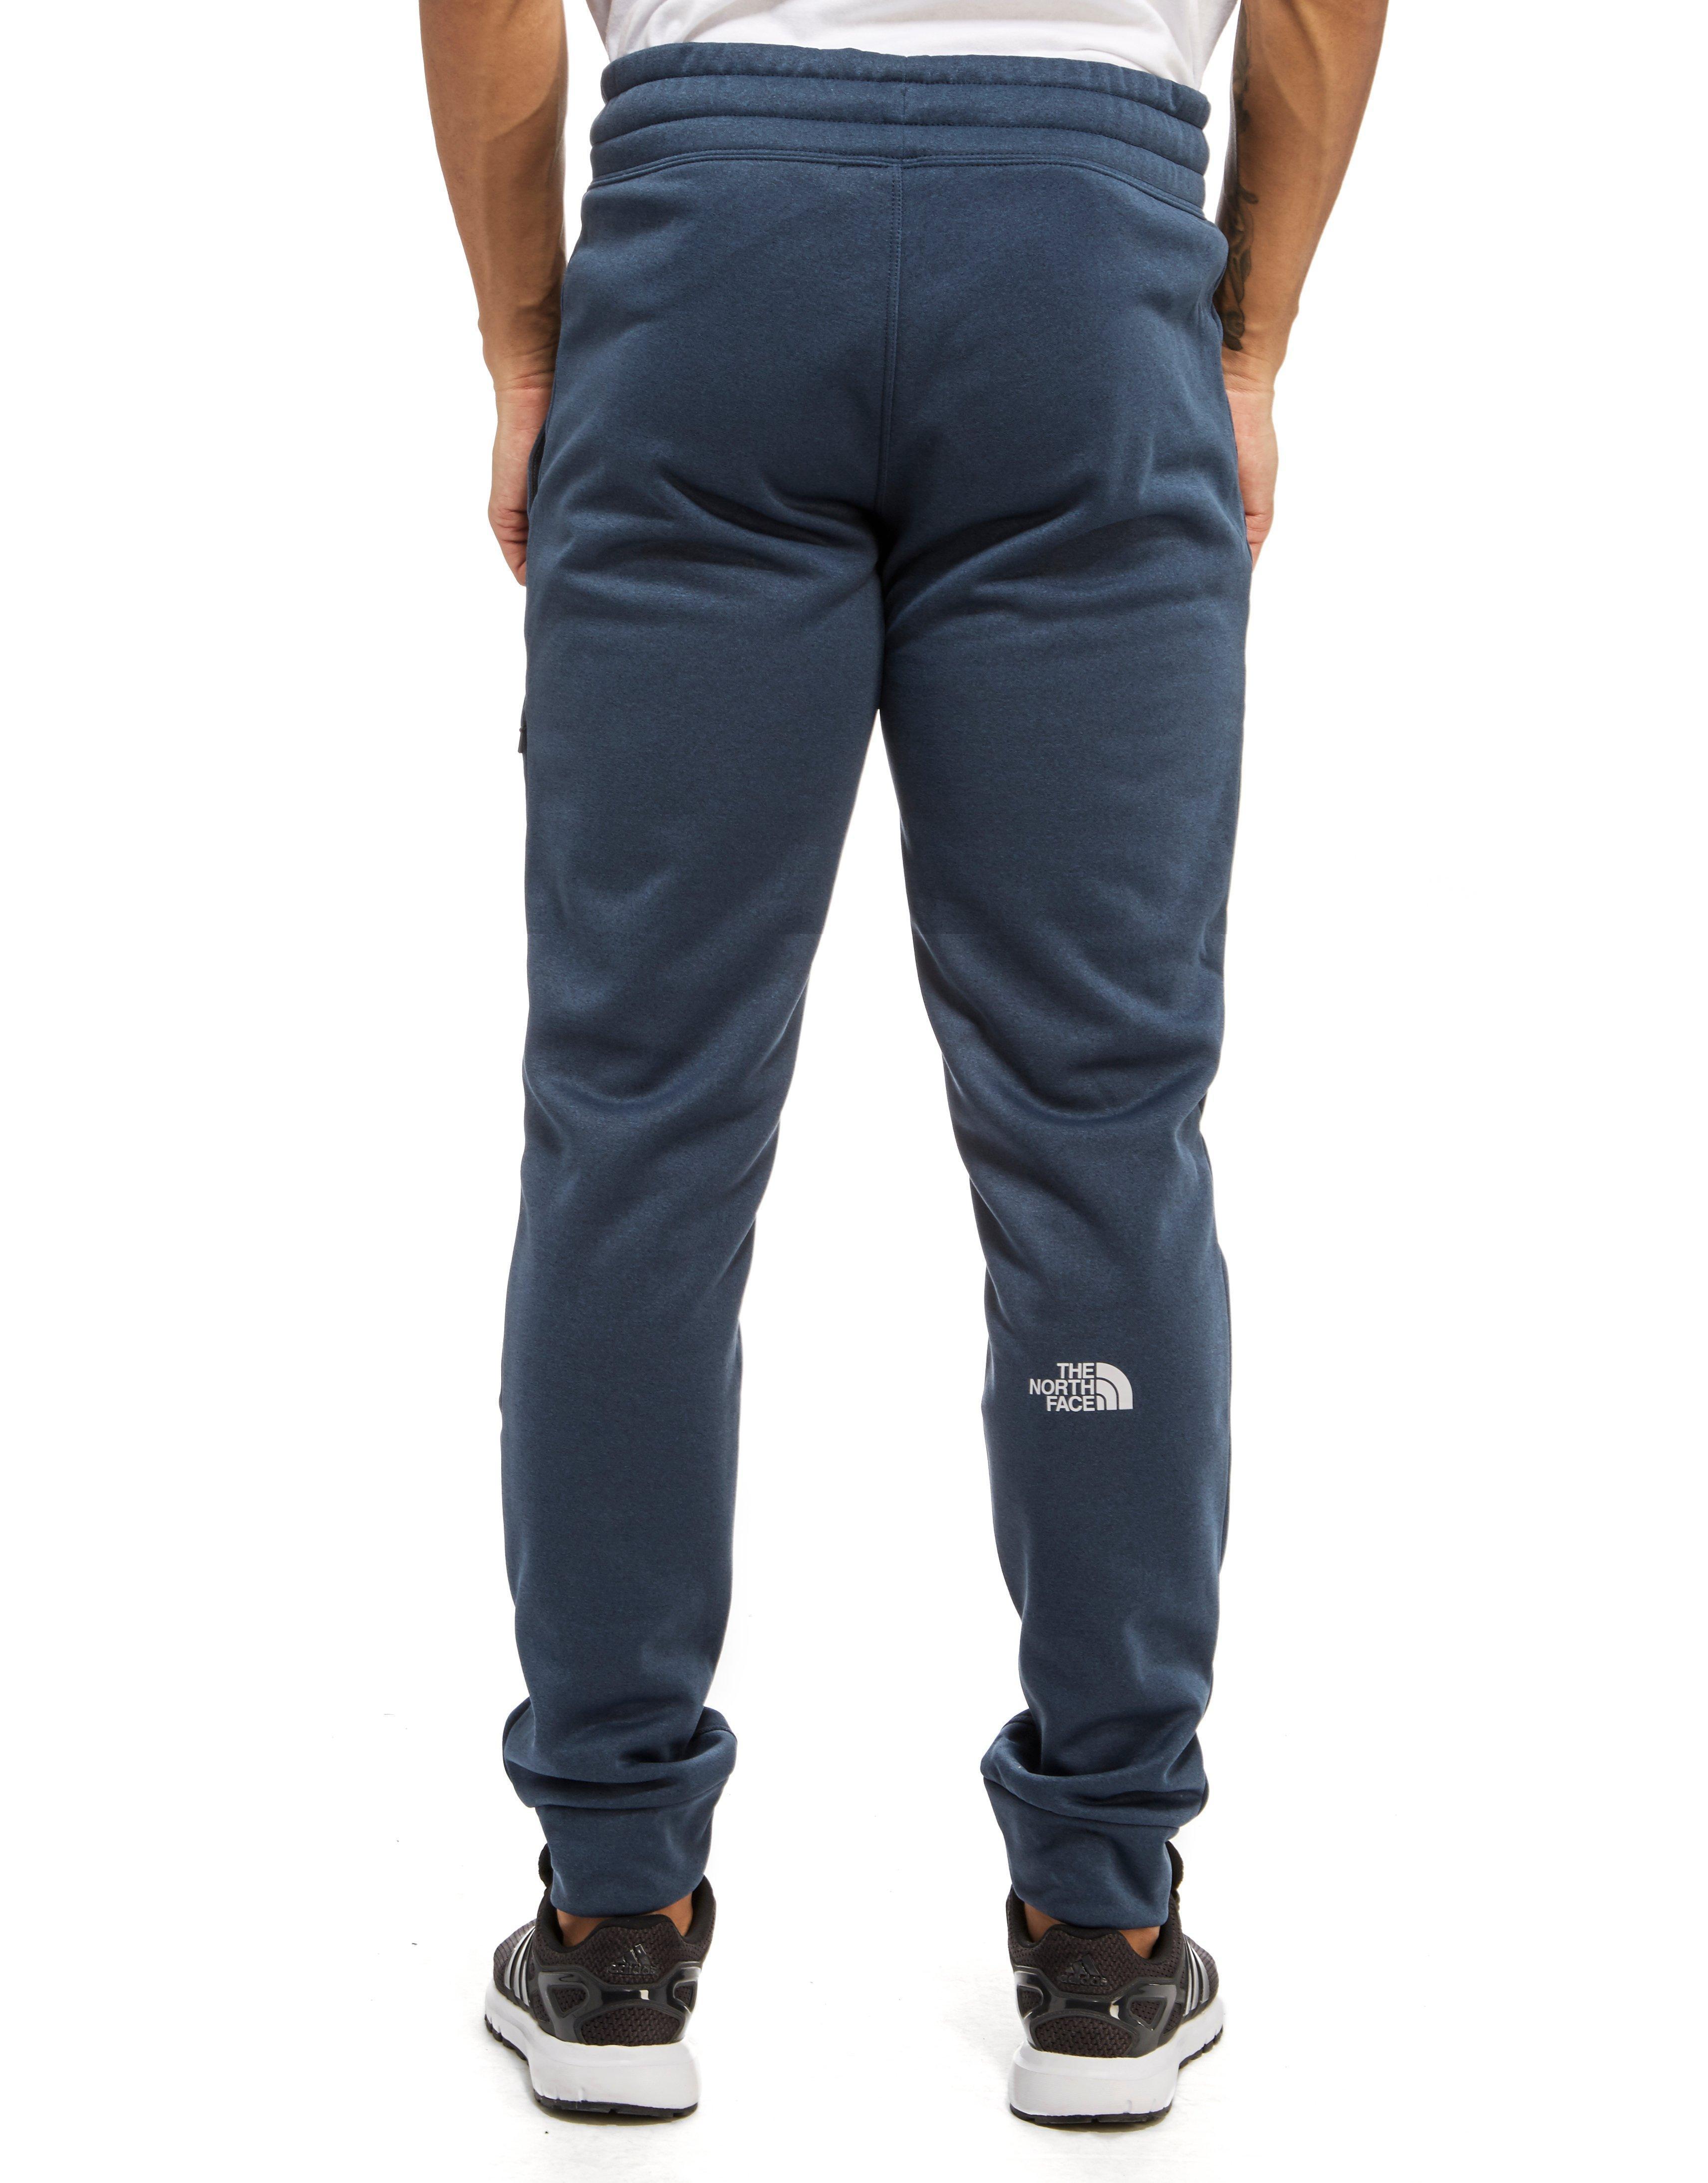 785dfc0e5 The North Face Blue Mittellegi Track Pants for men